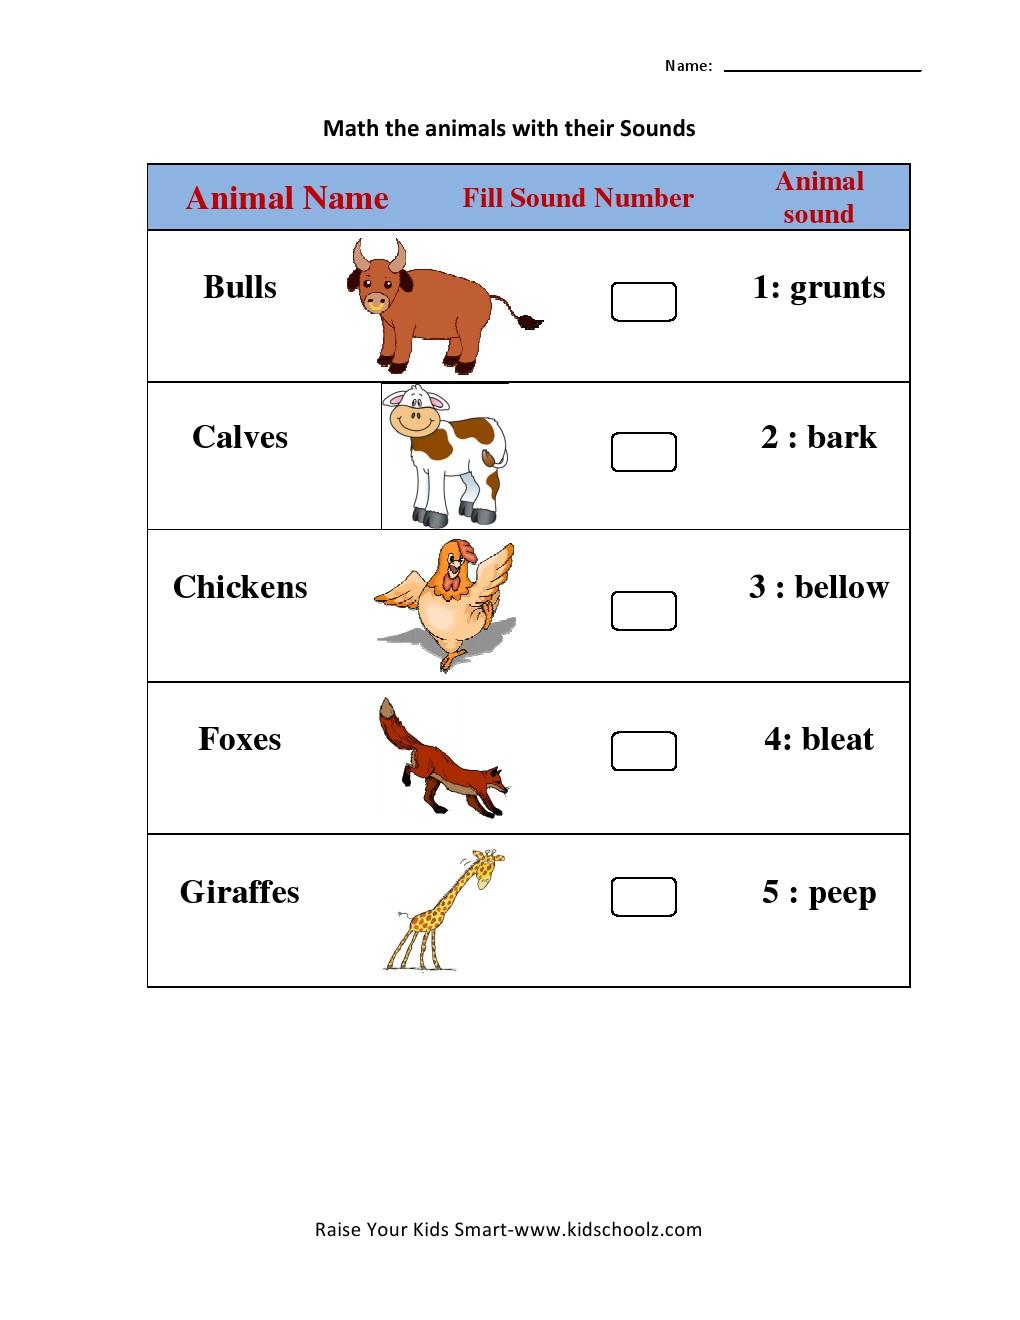 Workbooks matching preschool worksheets : Animal Sound Matching Worksheets 6 - Kidschoolz